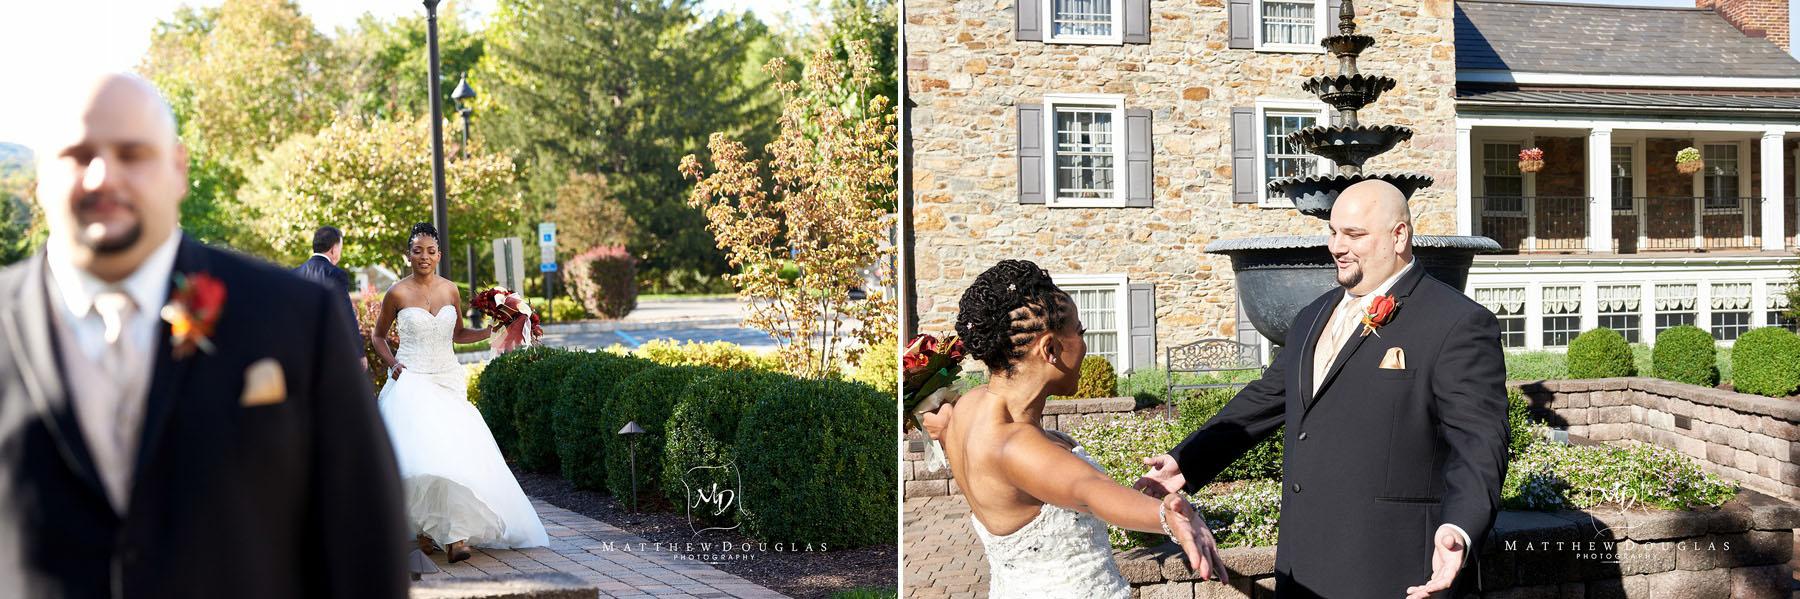 Weddings at The Farmhouse at The Grand Colonial Hampton NJ